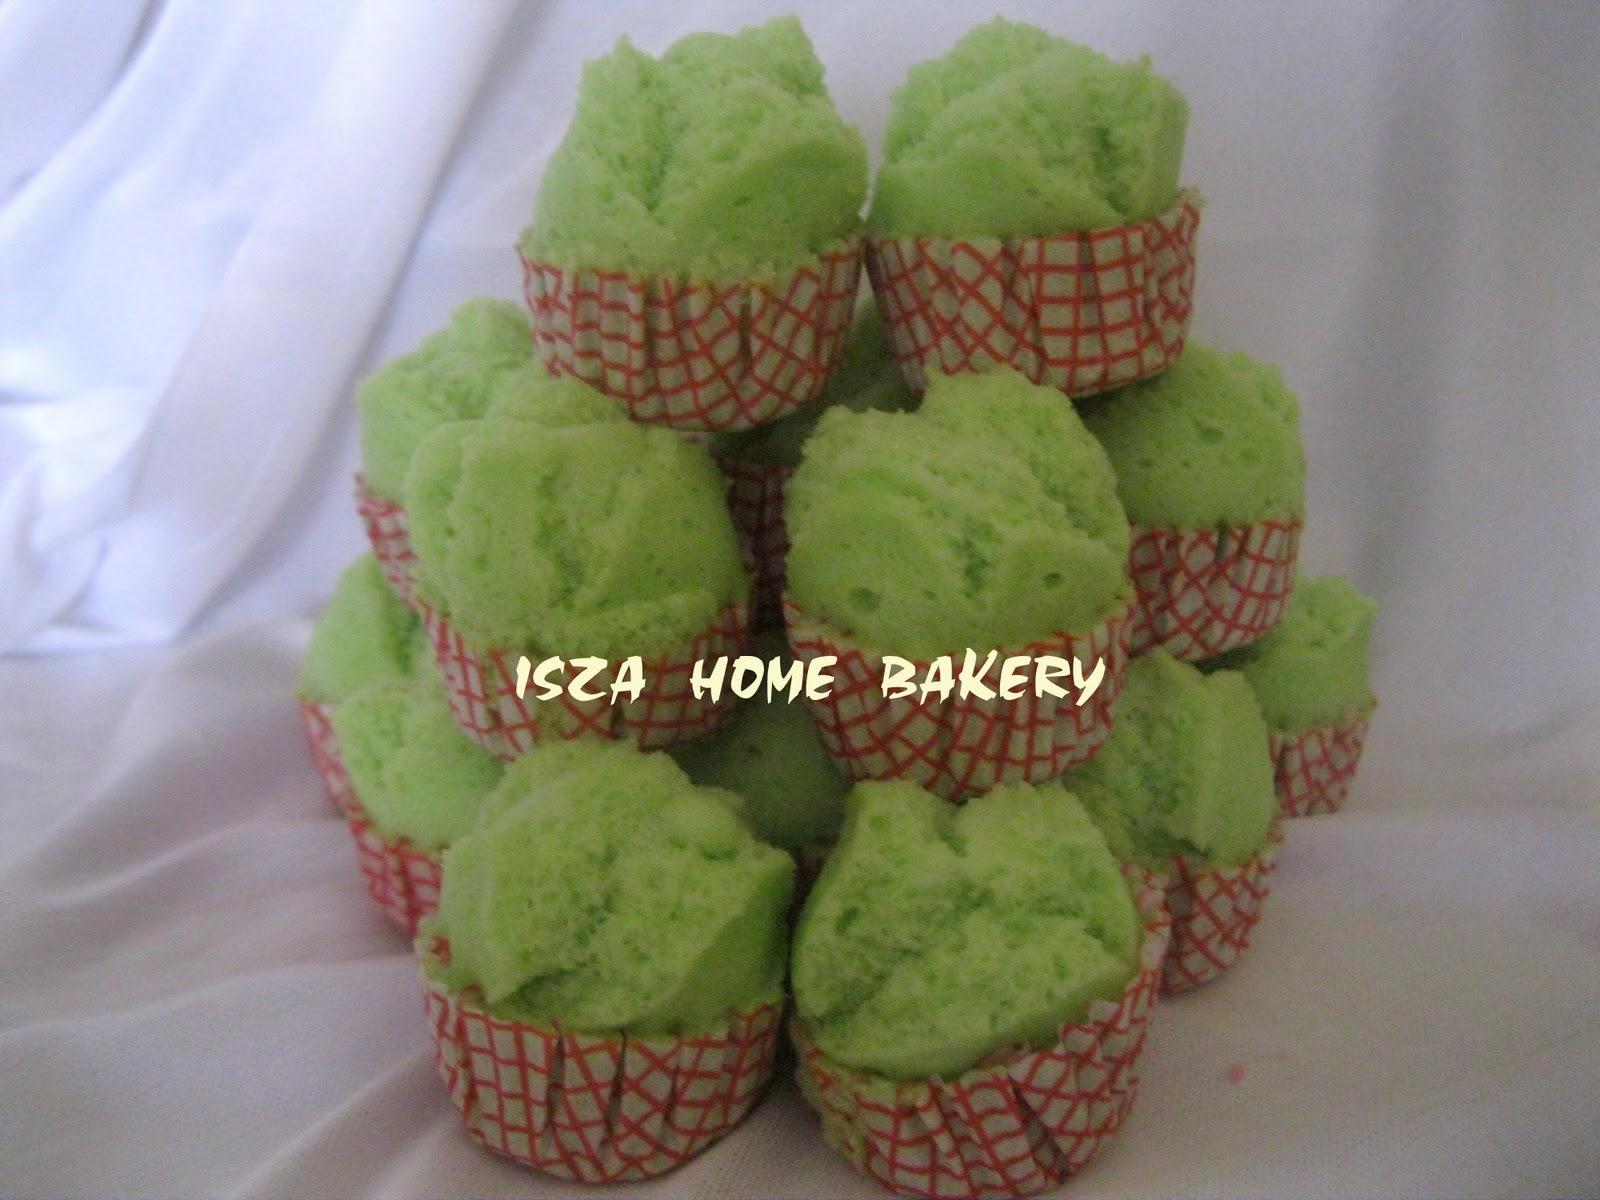 Apam mekar apam bunga isza home bakery Home mekar